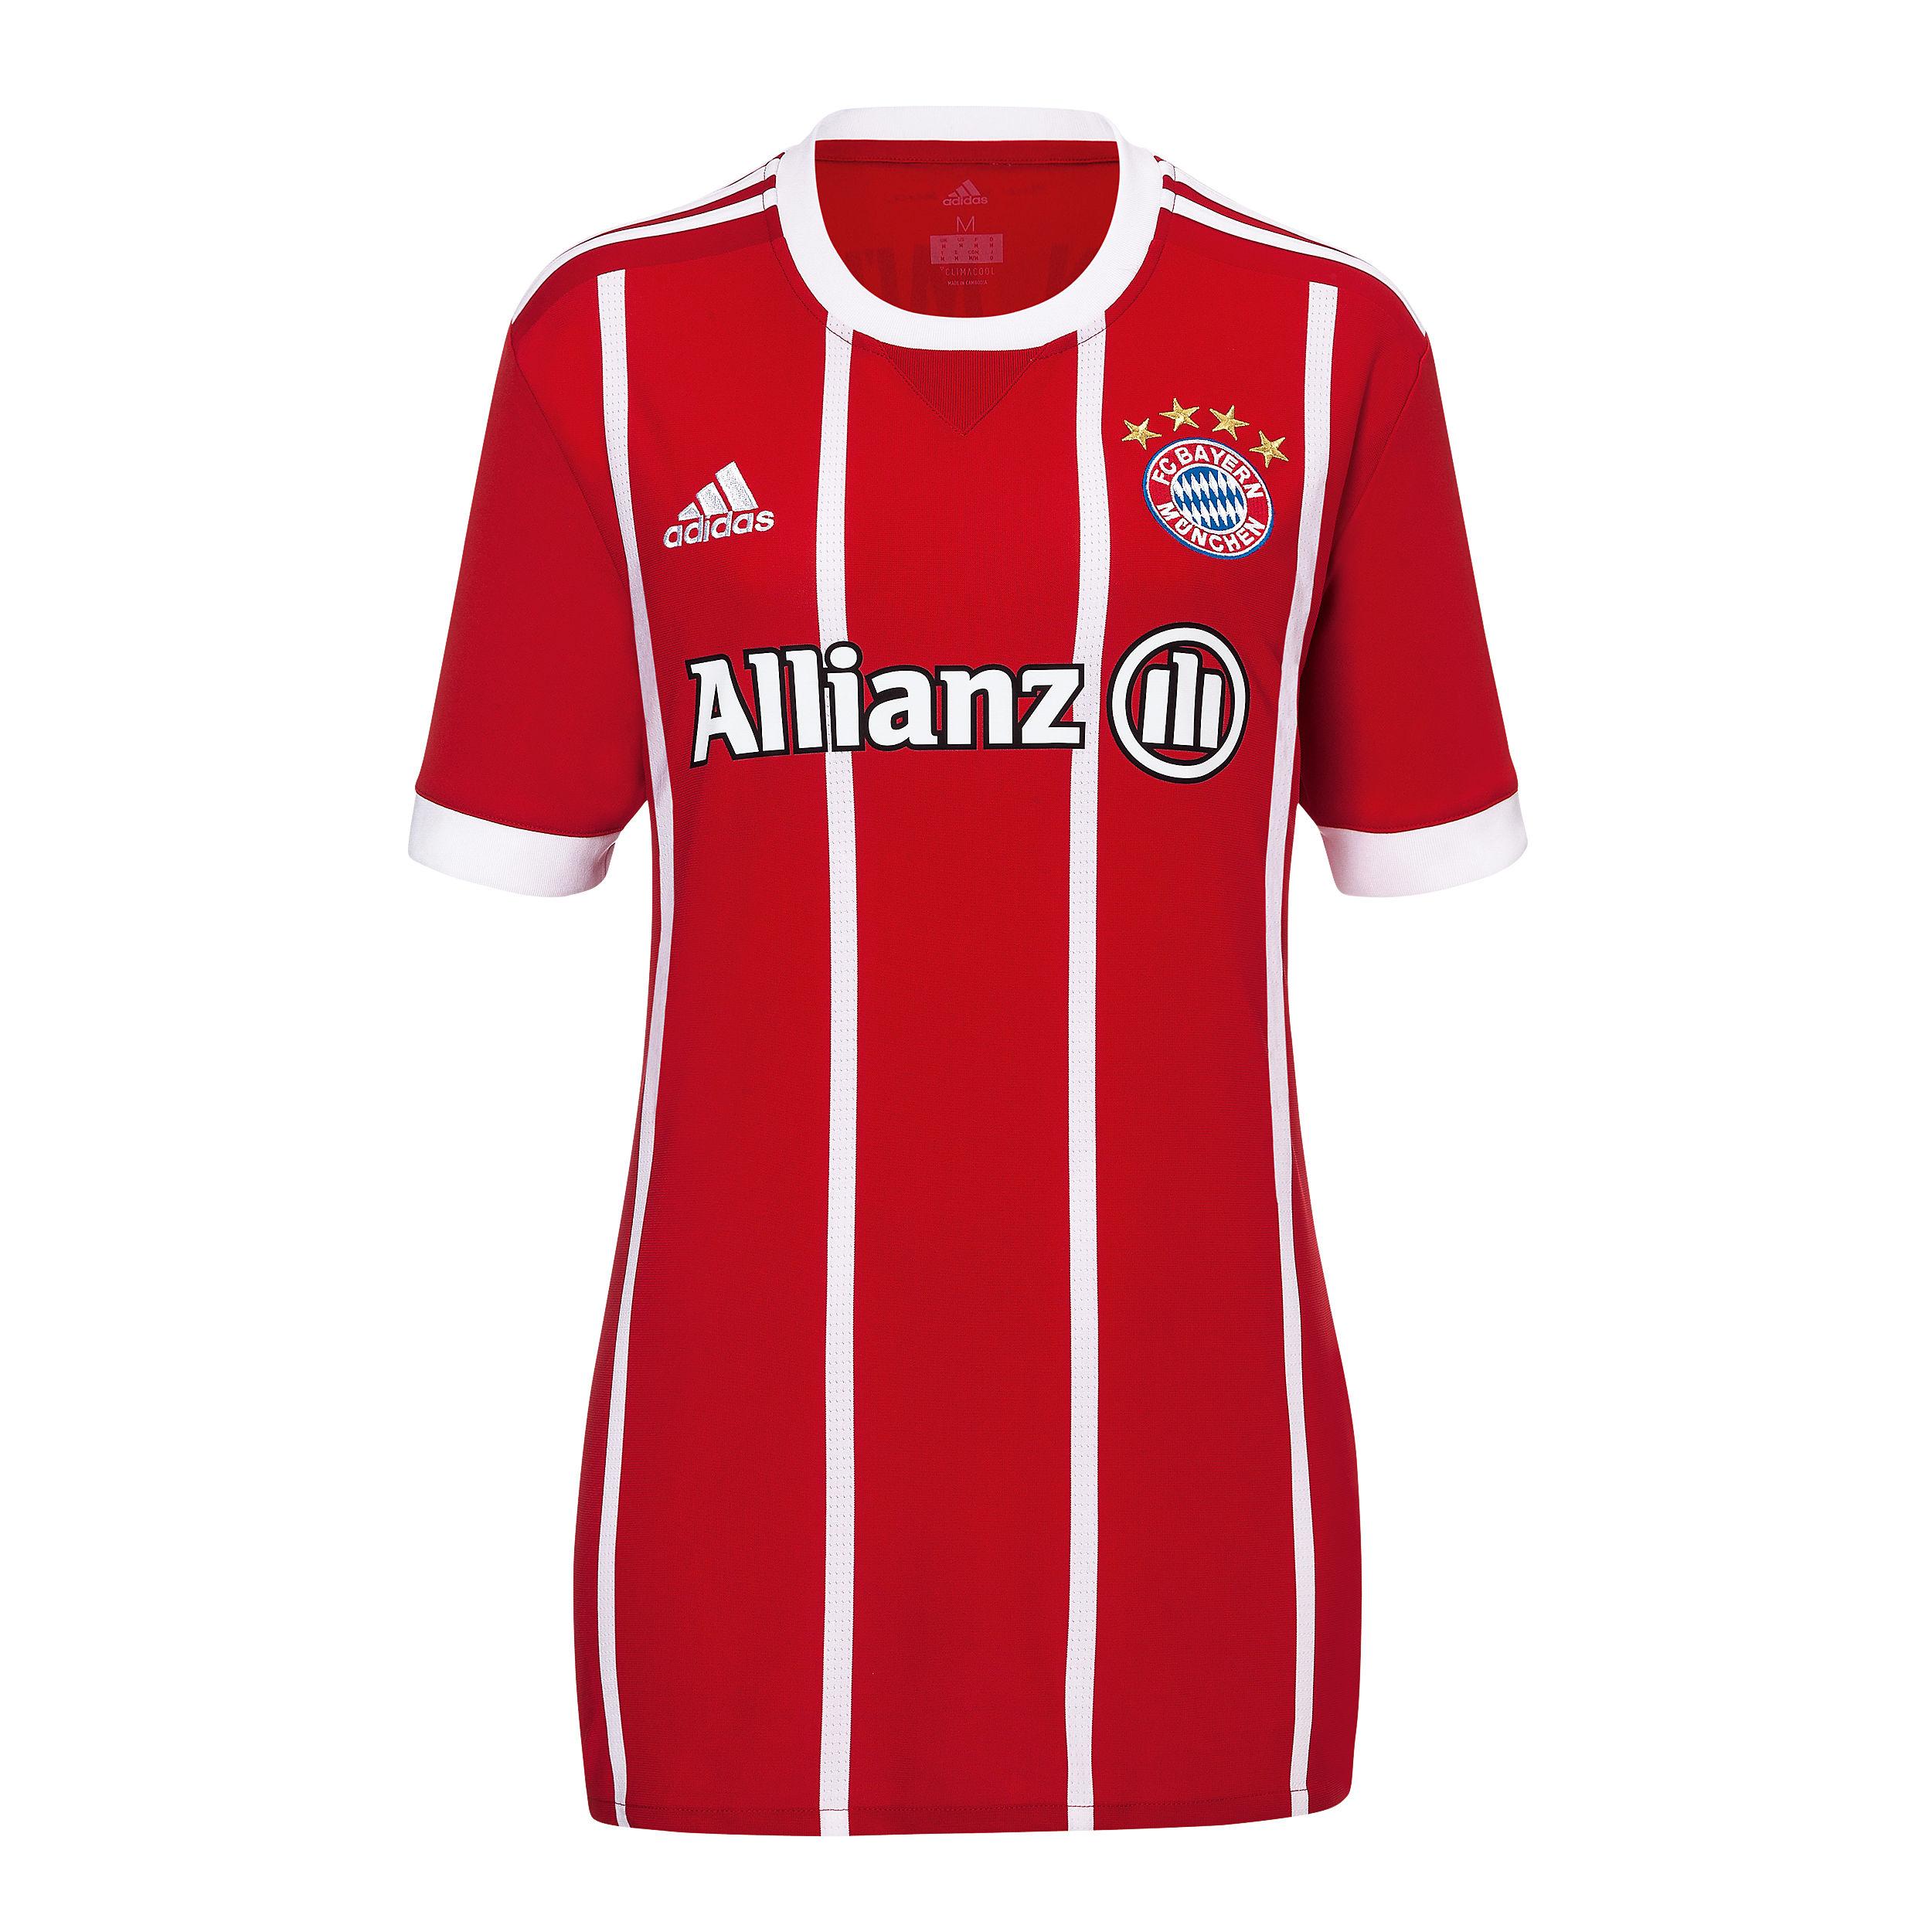 FC Bayern Trikot Home Frauen-Fußball (Allianz) ...